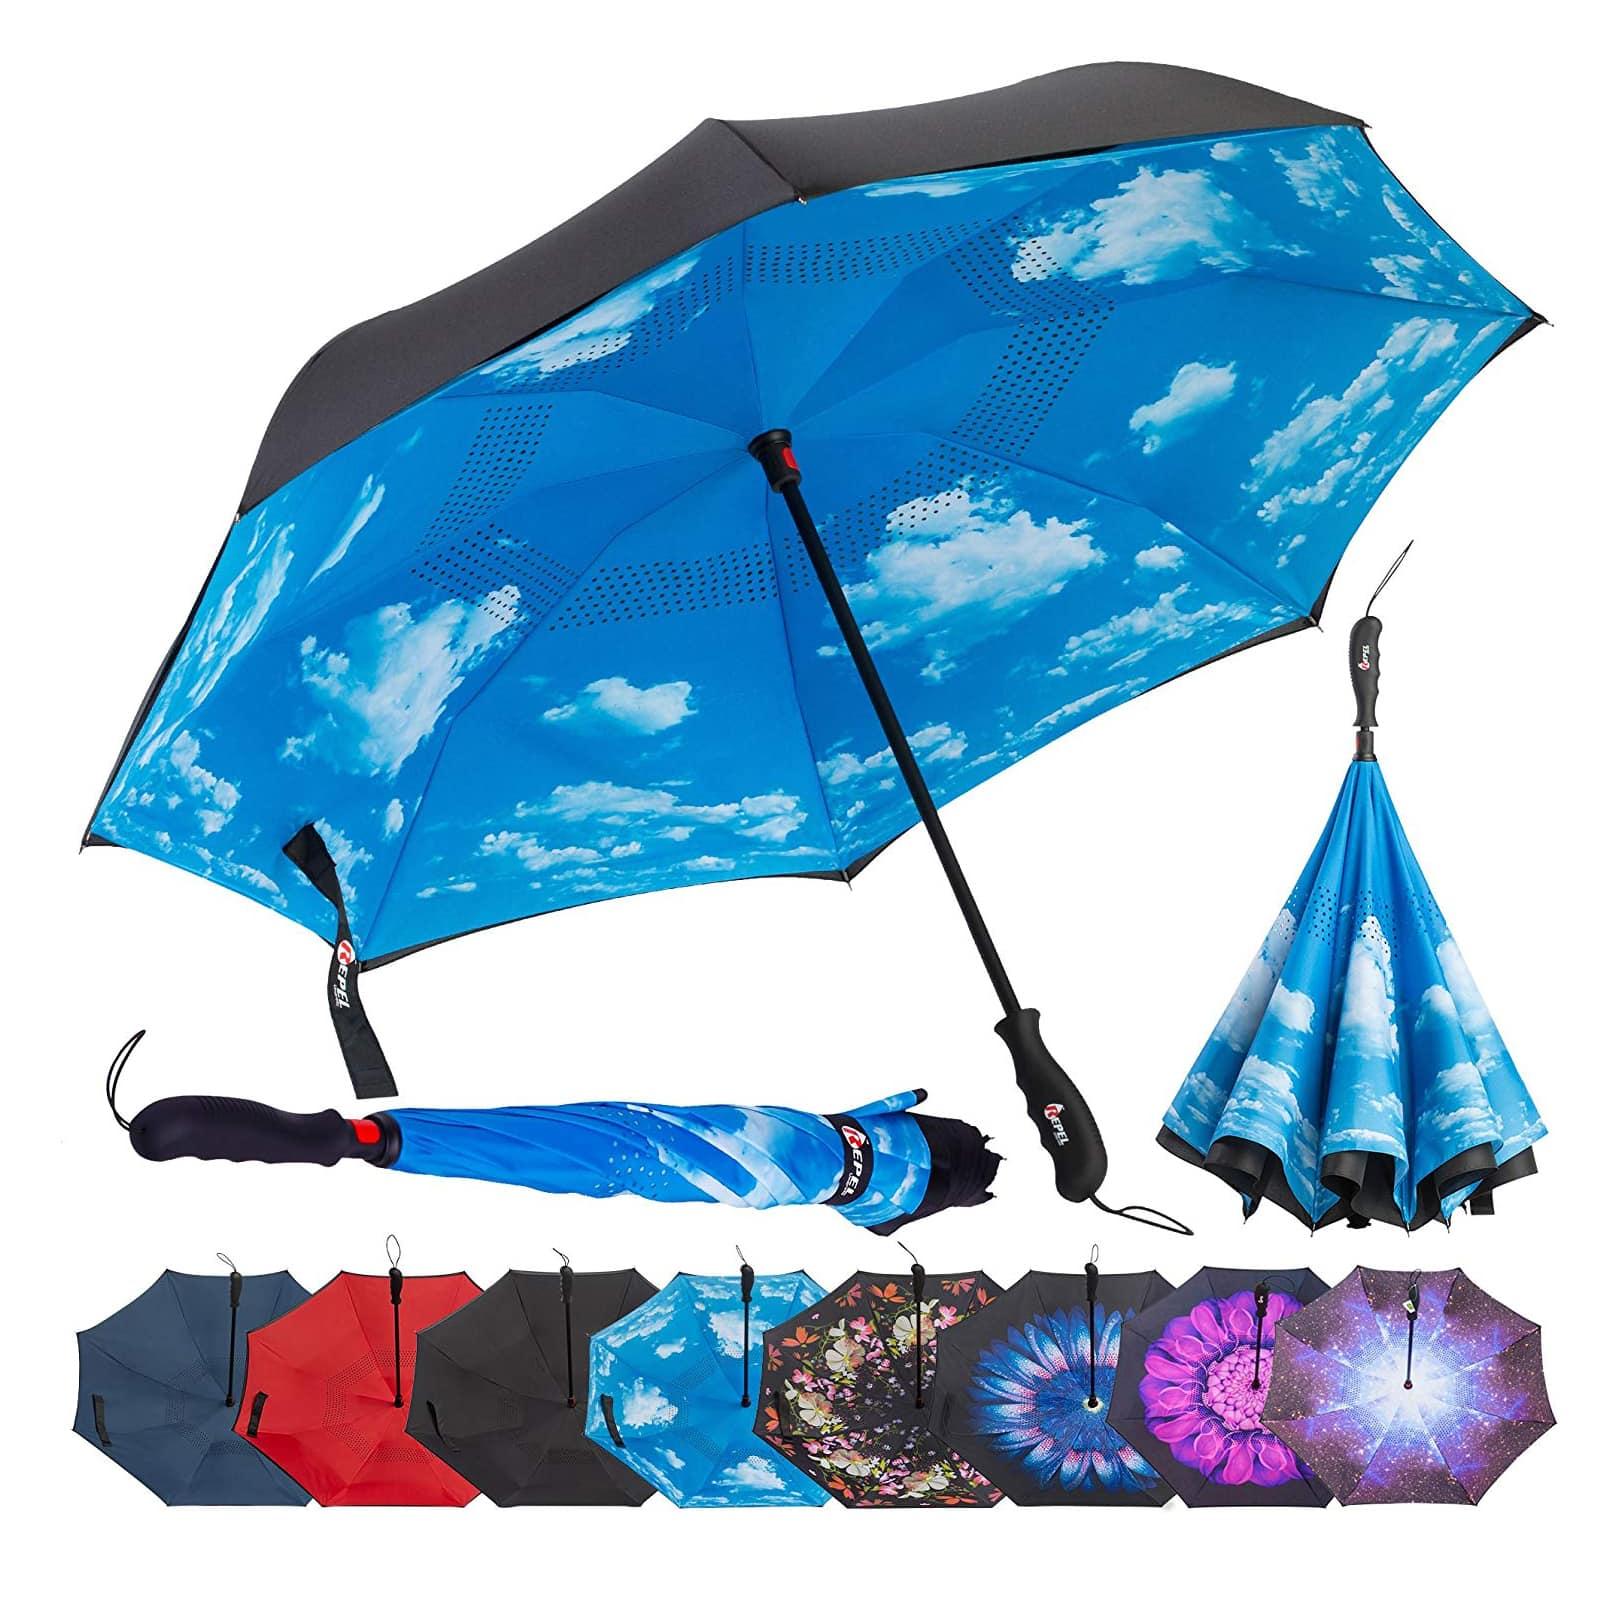 Repel Inverted Dual Layer Umbrella